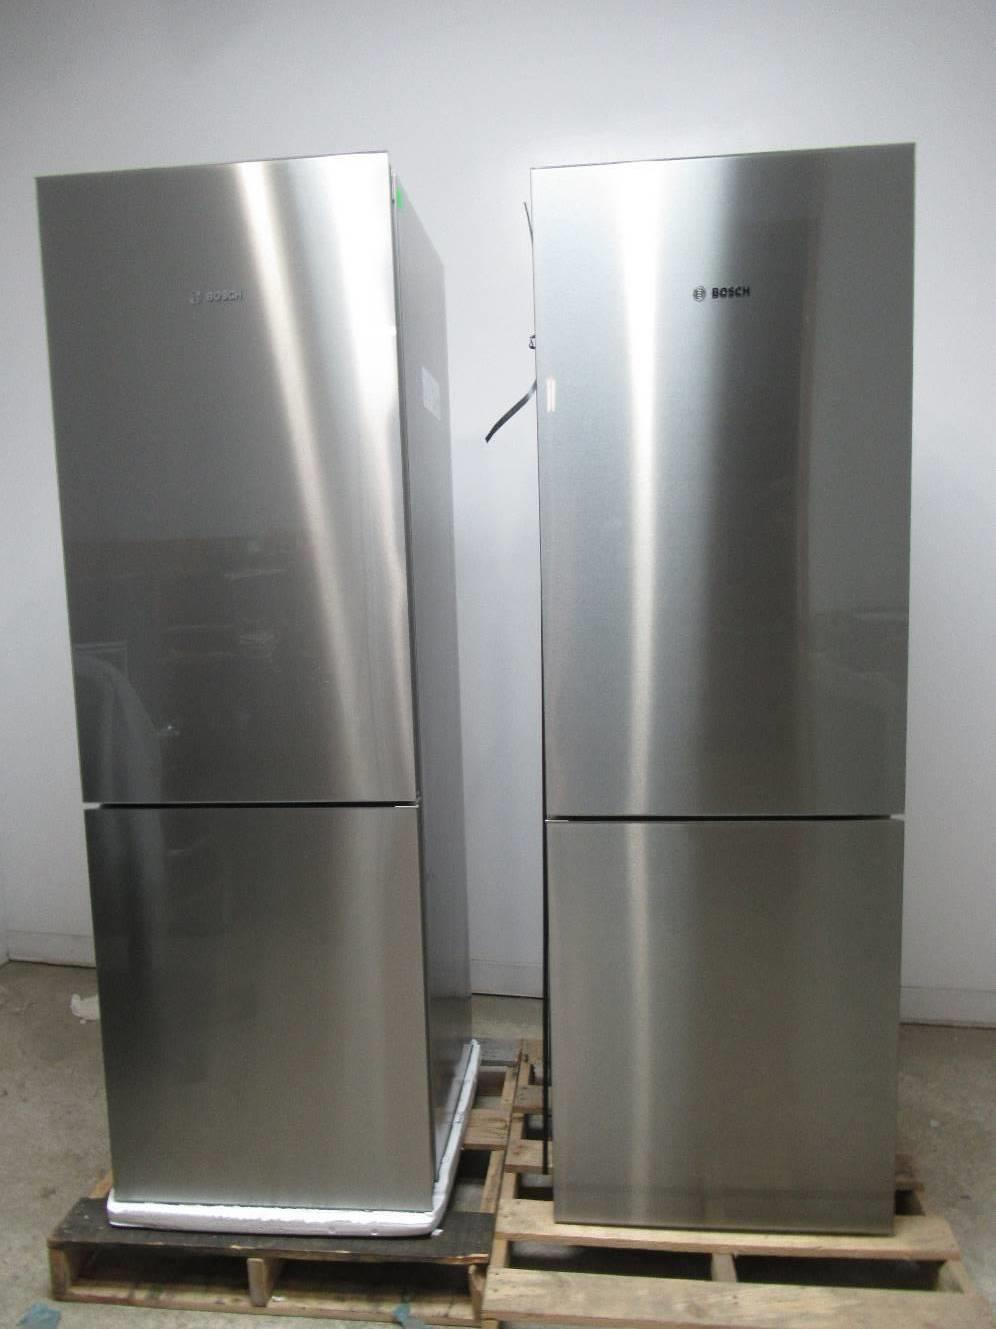 refrigerators counter depth fridge simple standard countertop others kitchen countertops inside refrigerator depths